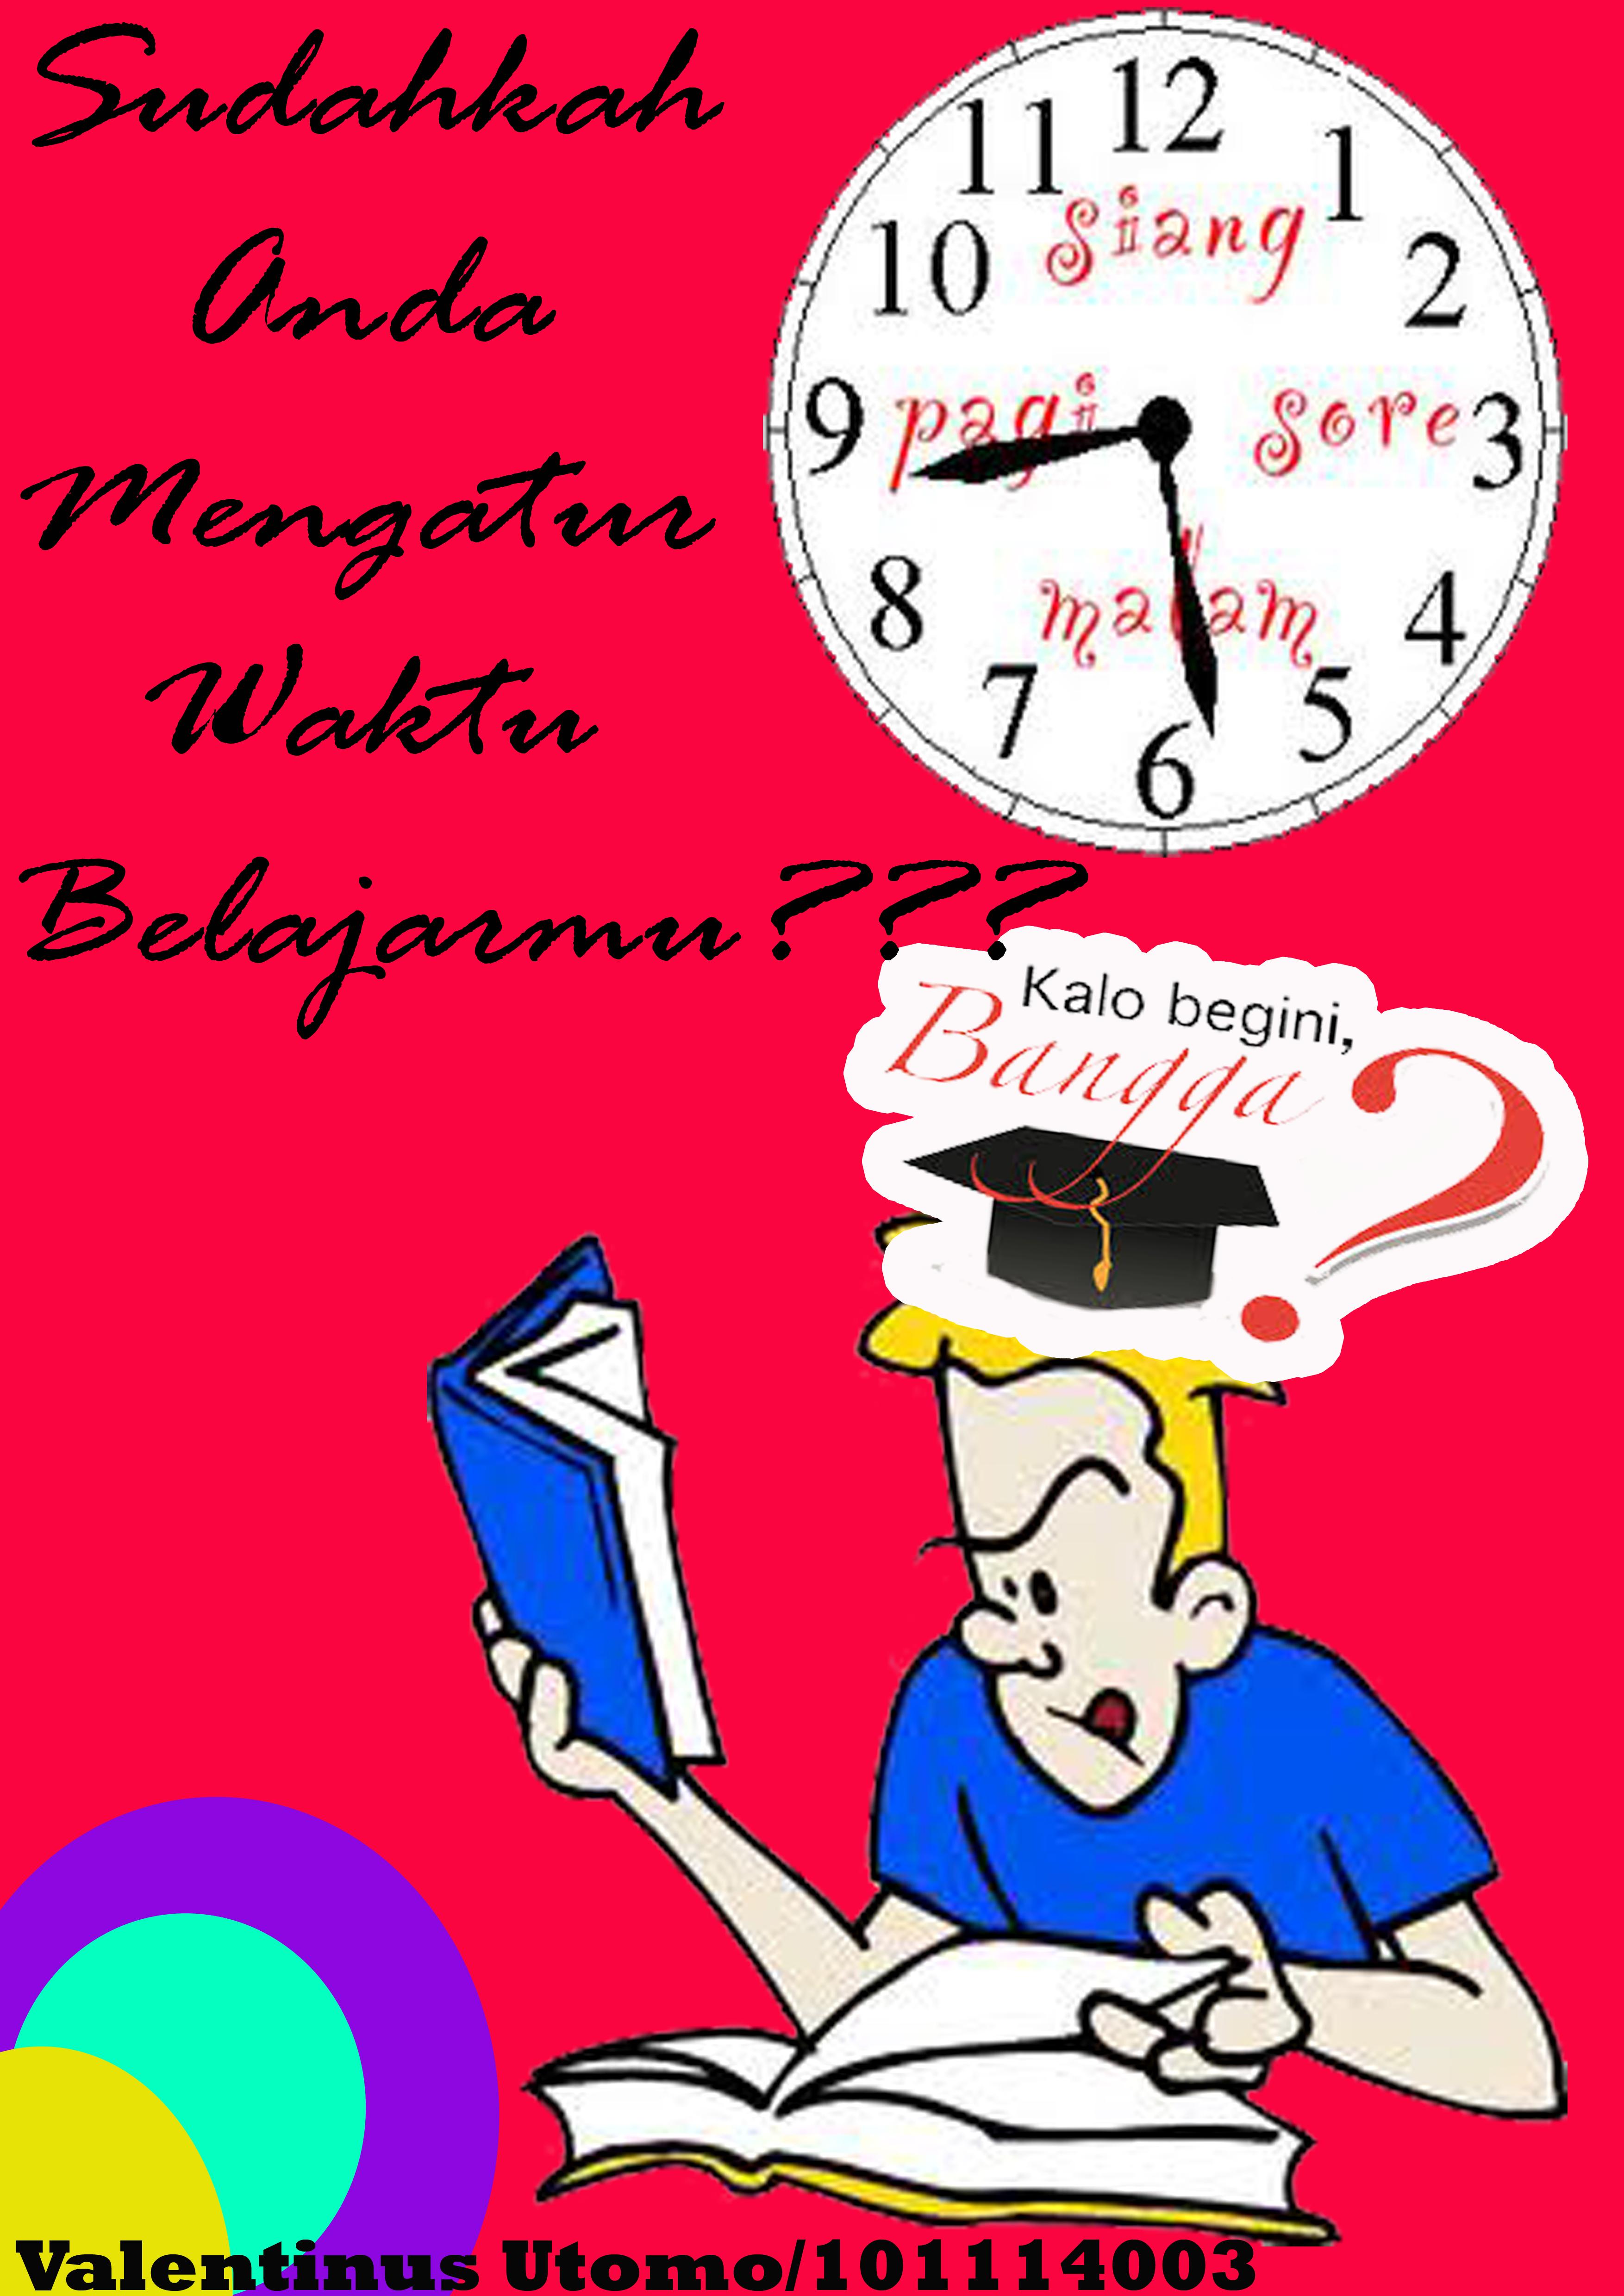 Poster Manajemen Waktu Belajar Utomovalentinus